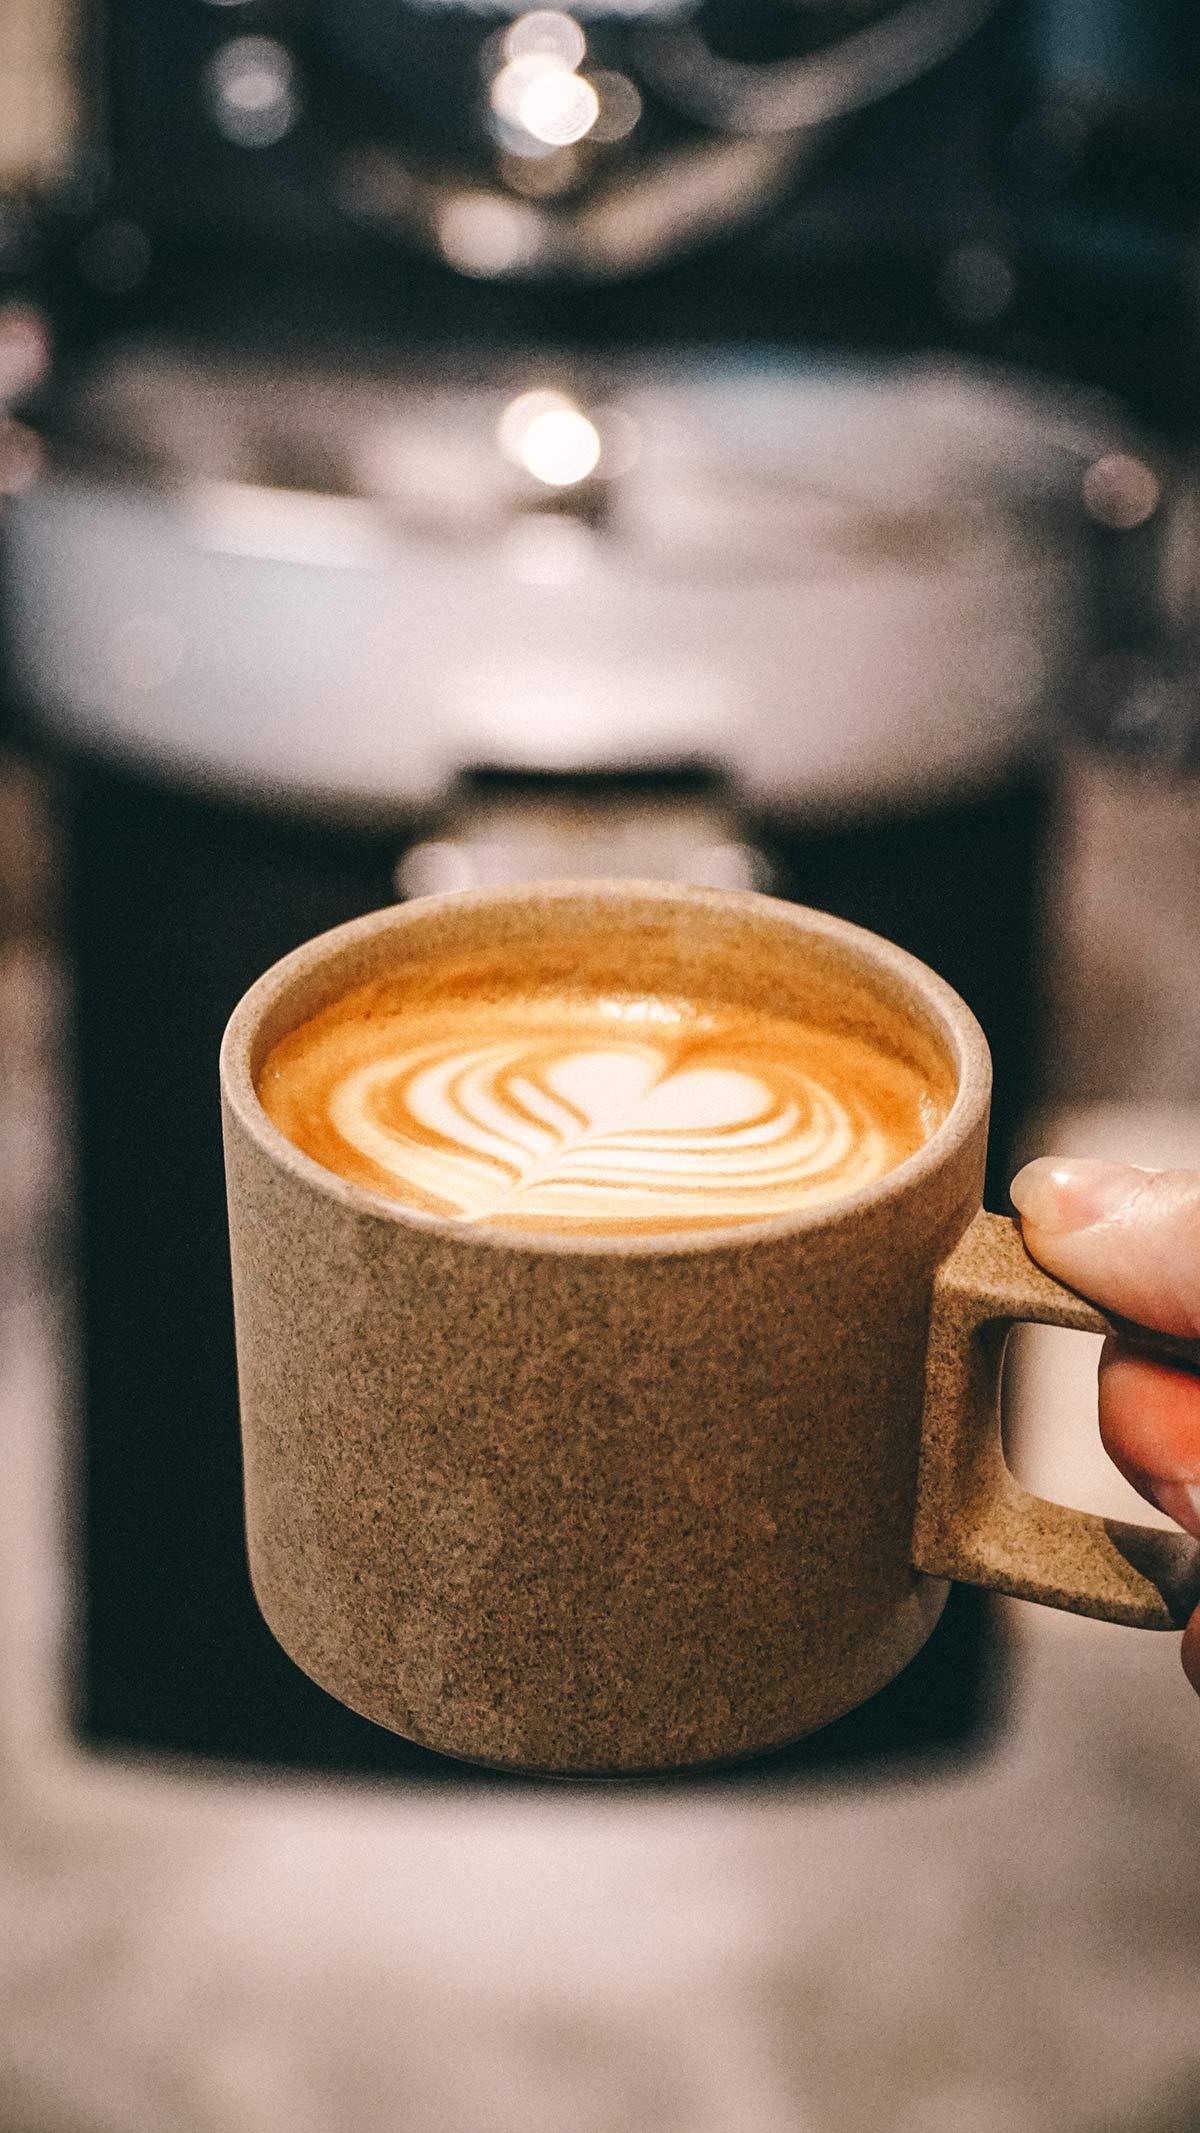 Forth Cafe Tasse Kaffee